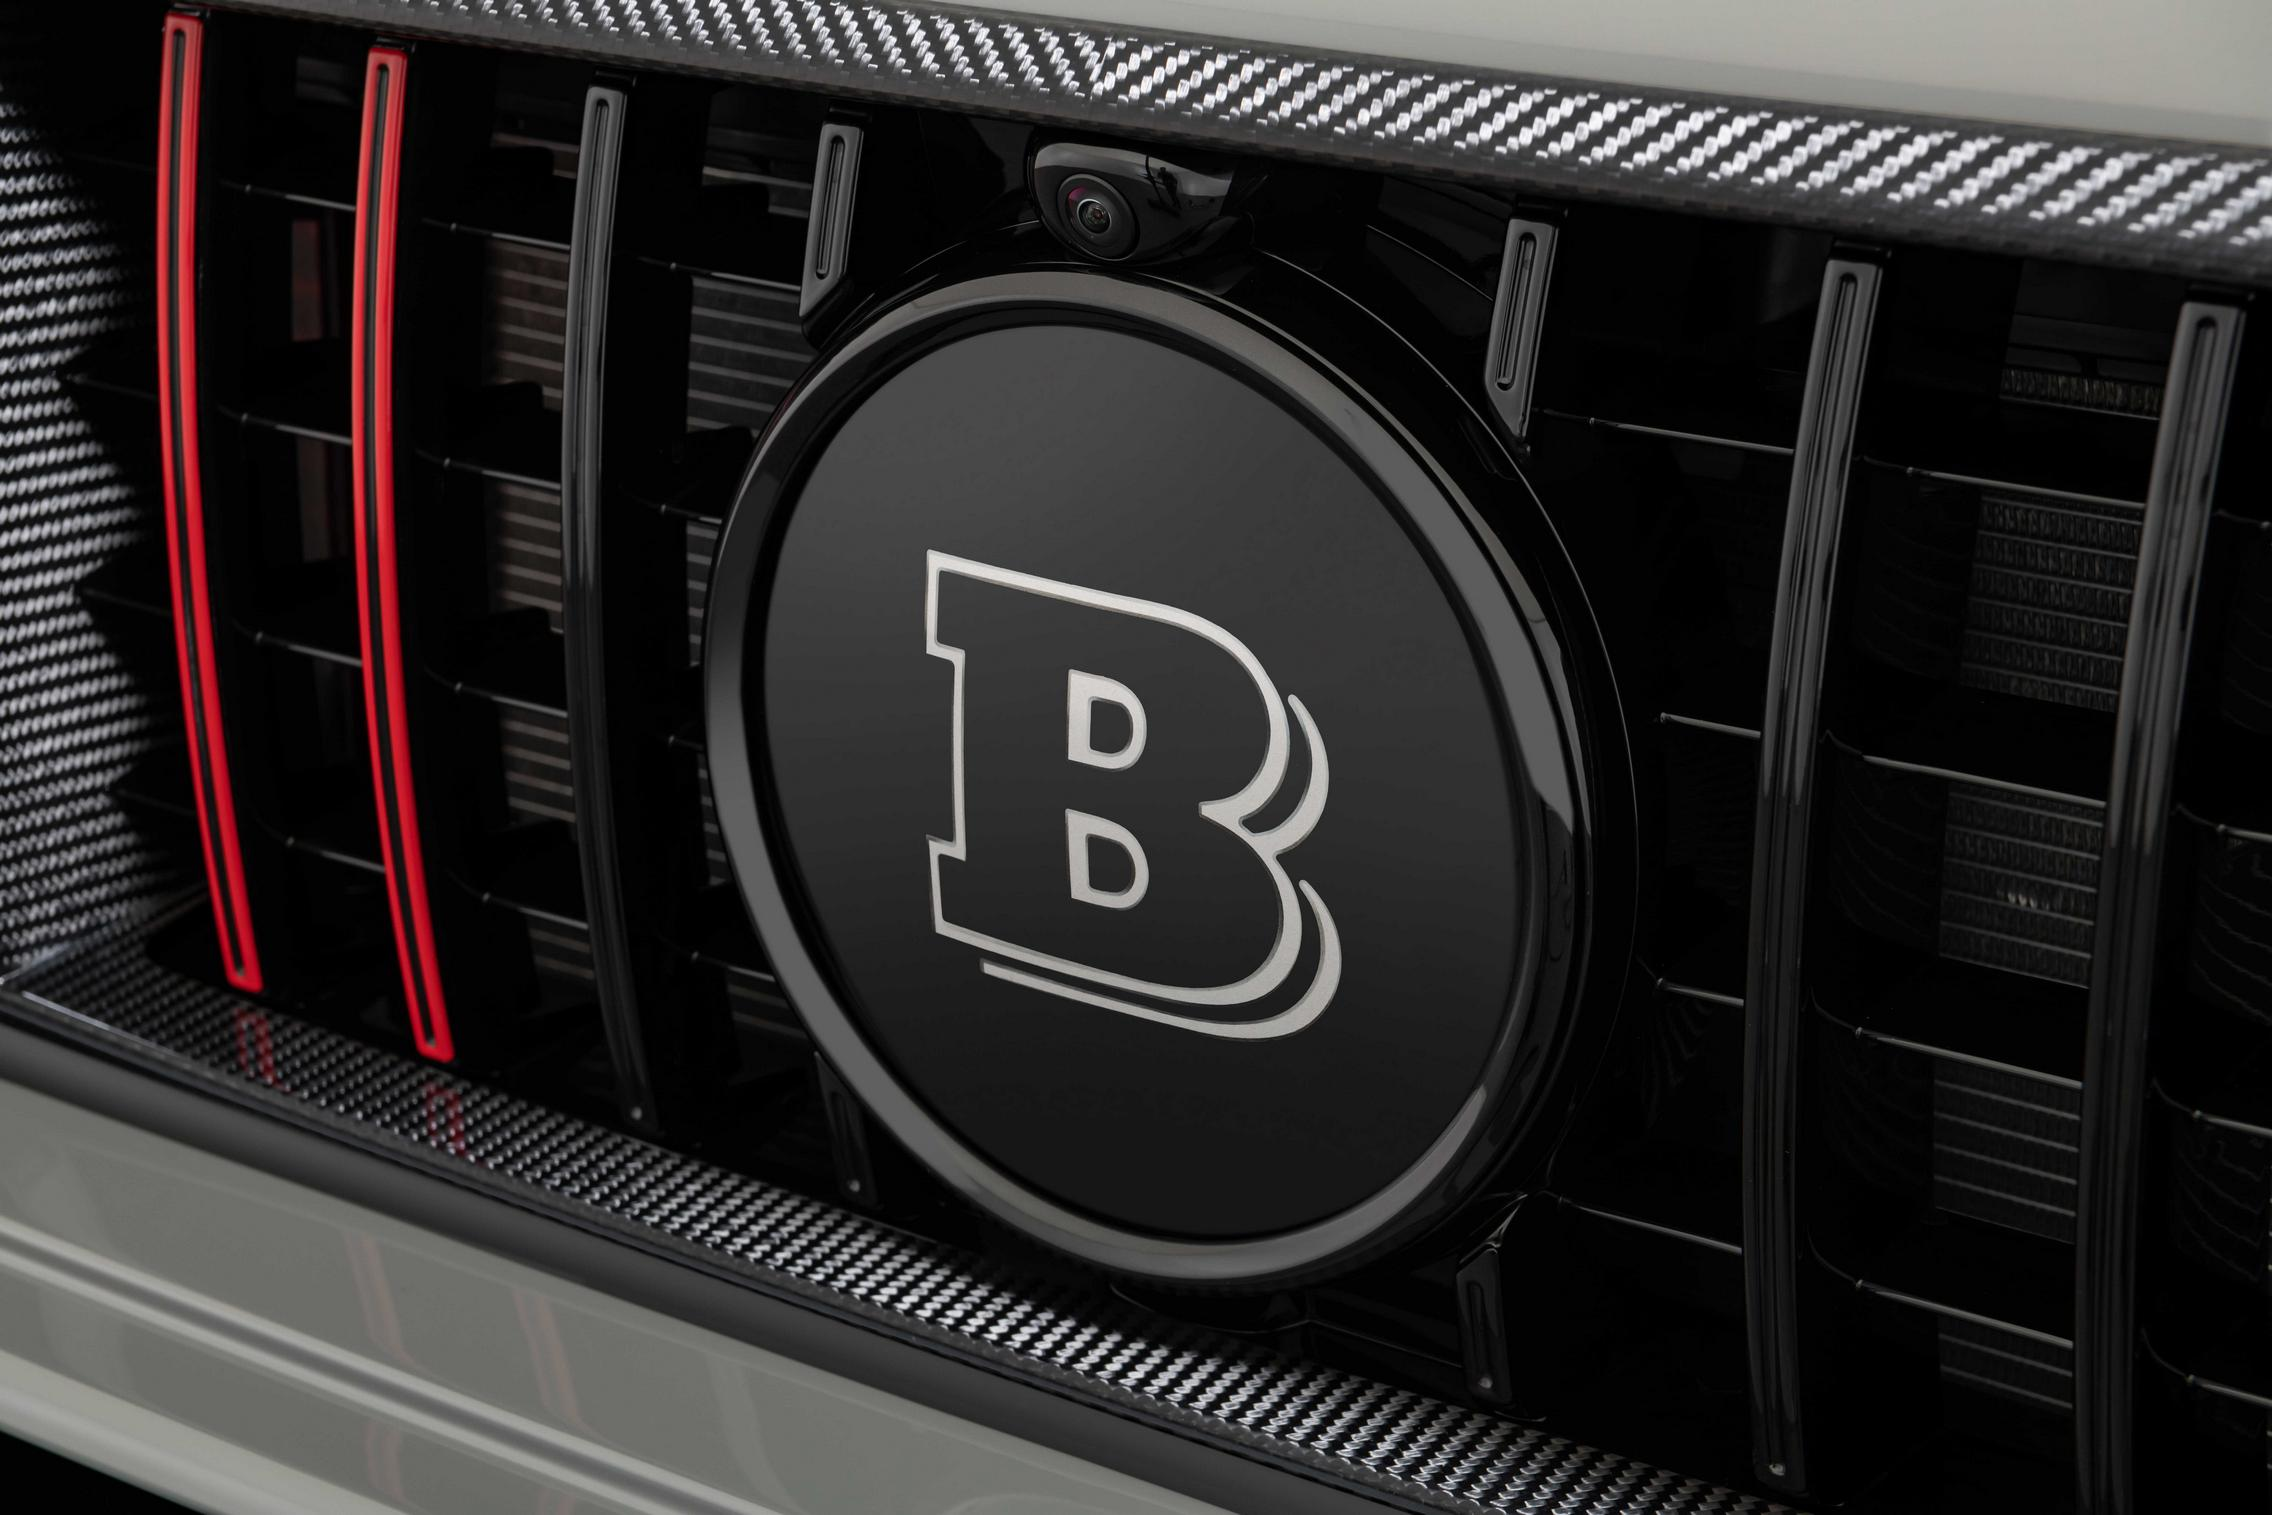 Brabus Badge